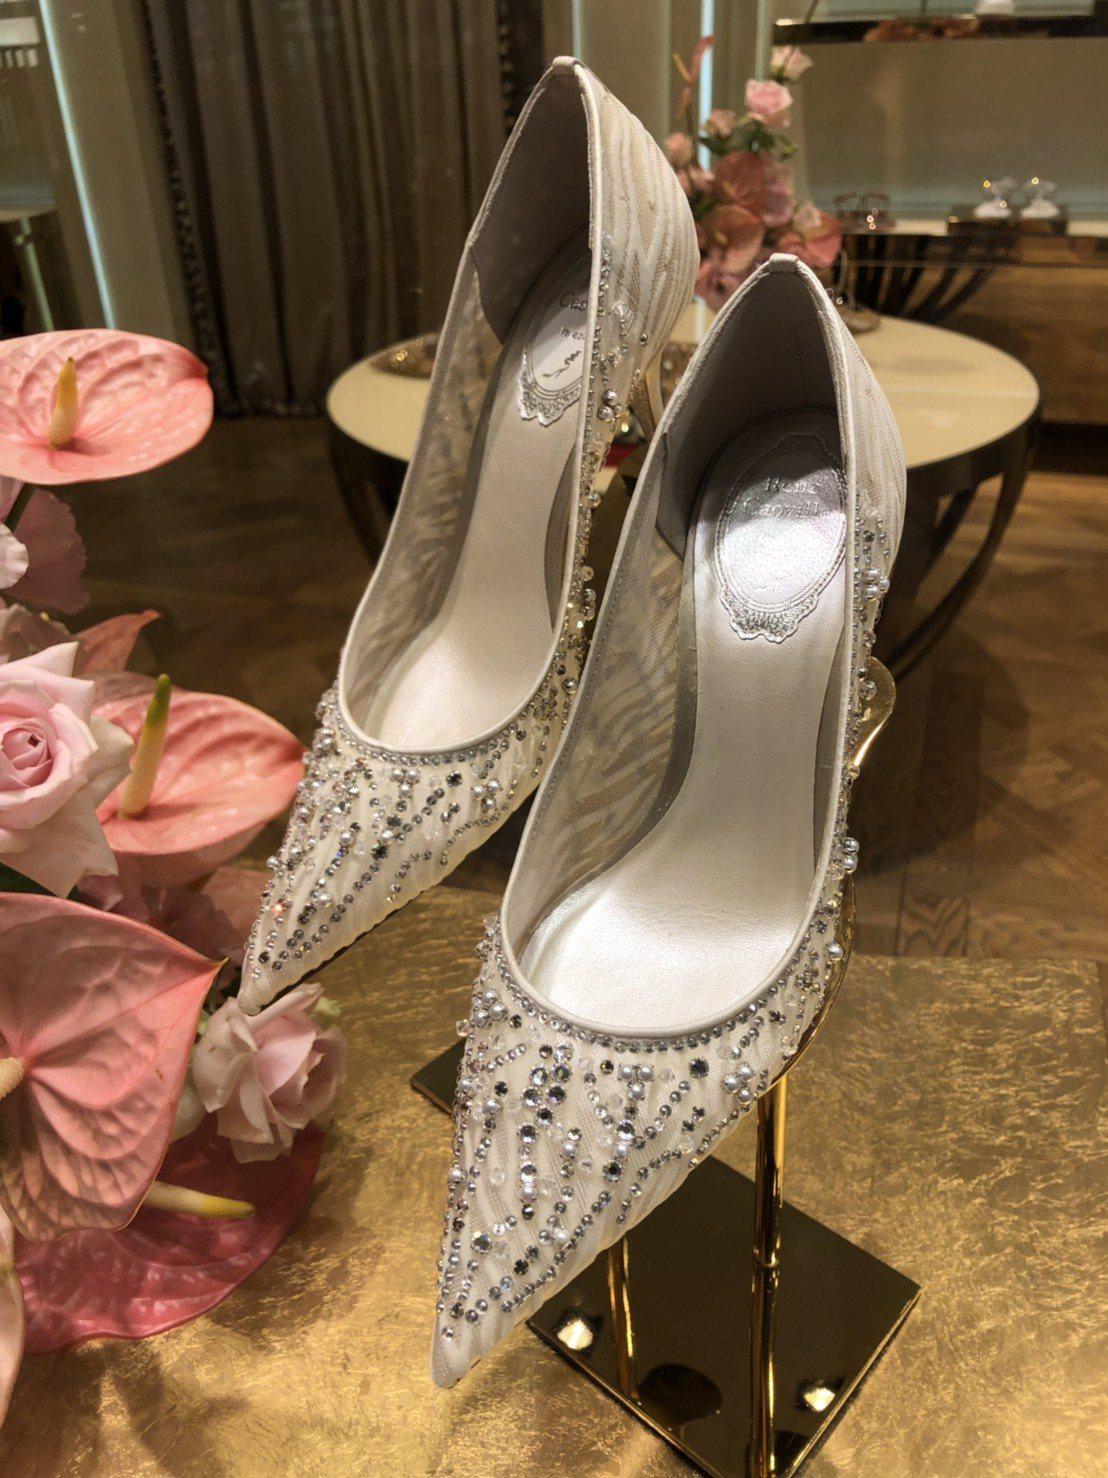 Rene Caovilla送給林志玲的婚鞋,售價45,000元。記者楊詩涵/攝影